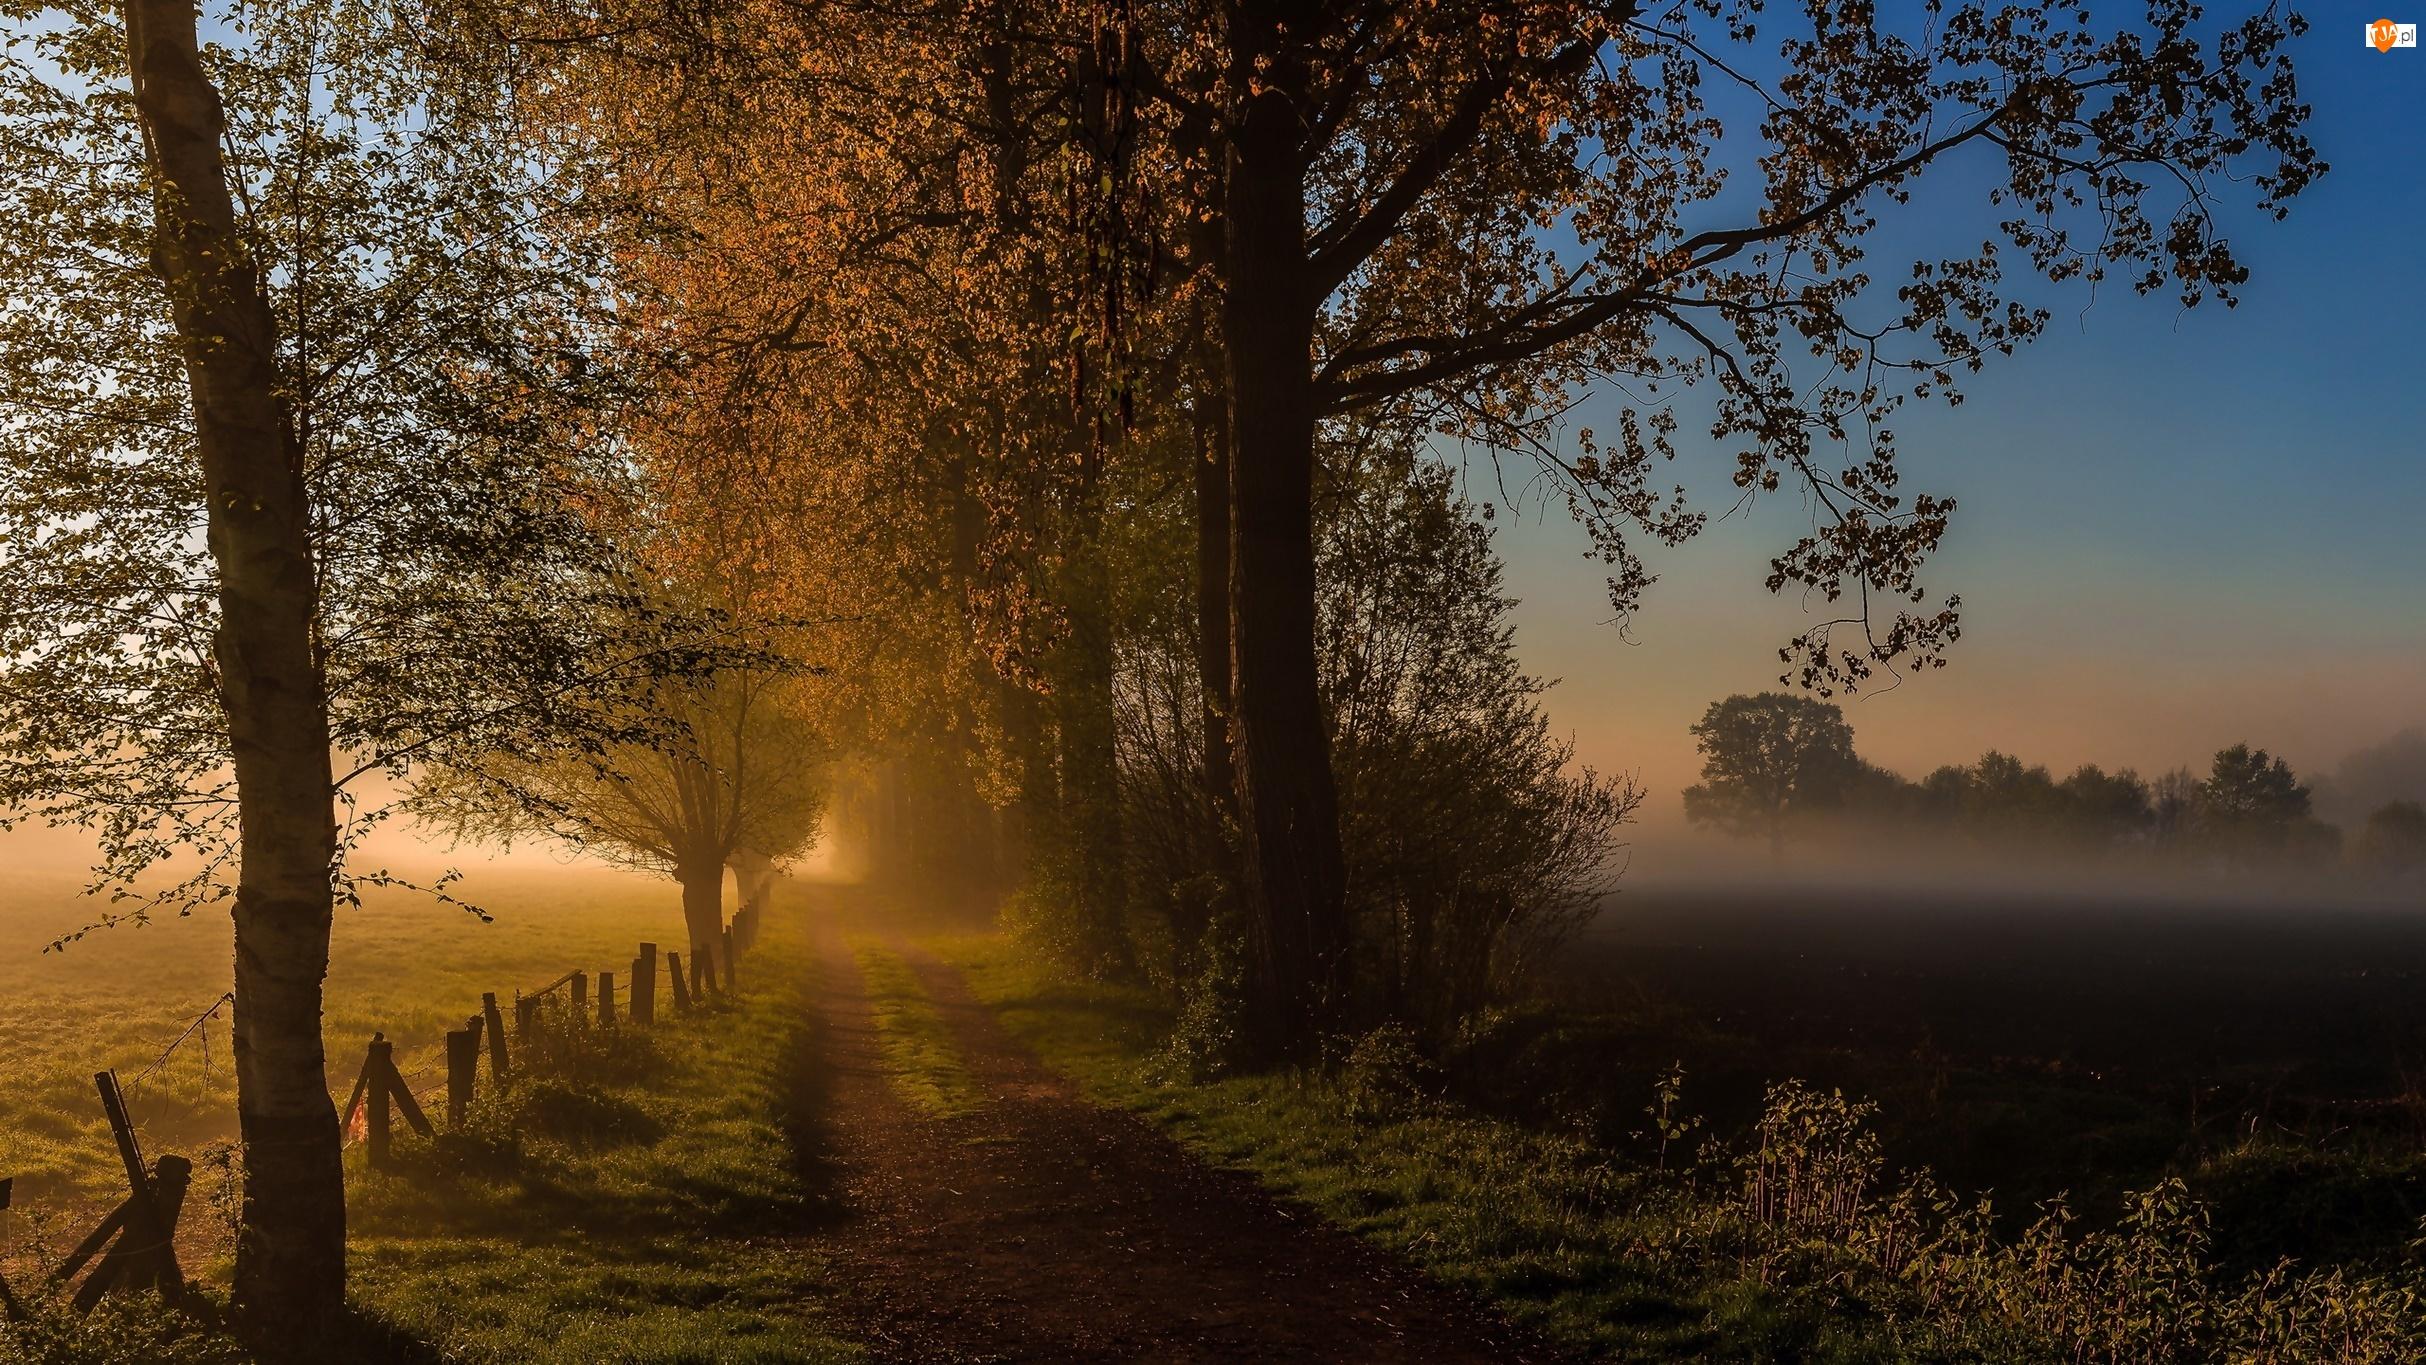 Polna Droga, Mgła, Drzewa, Poranek